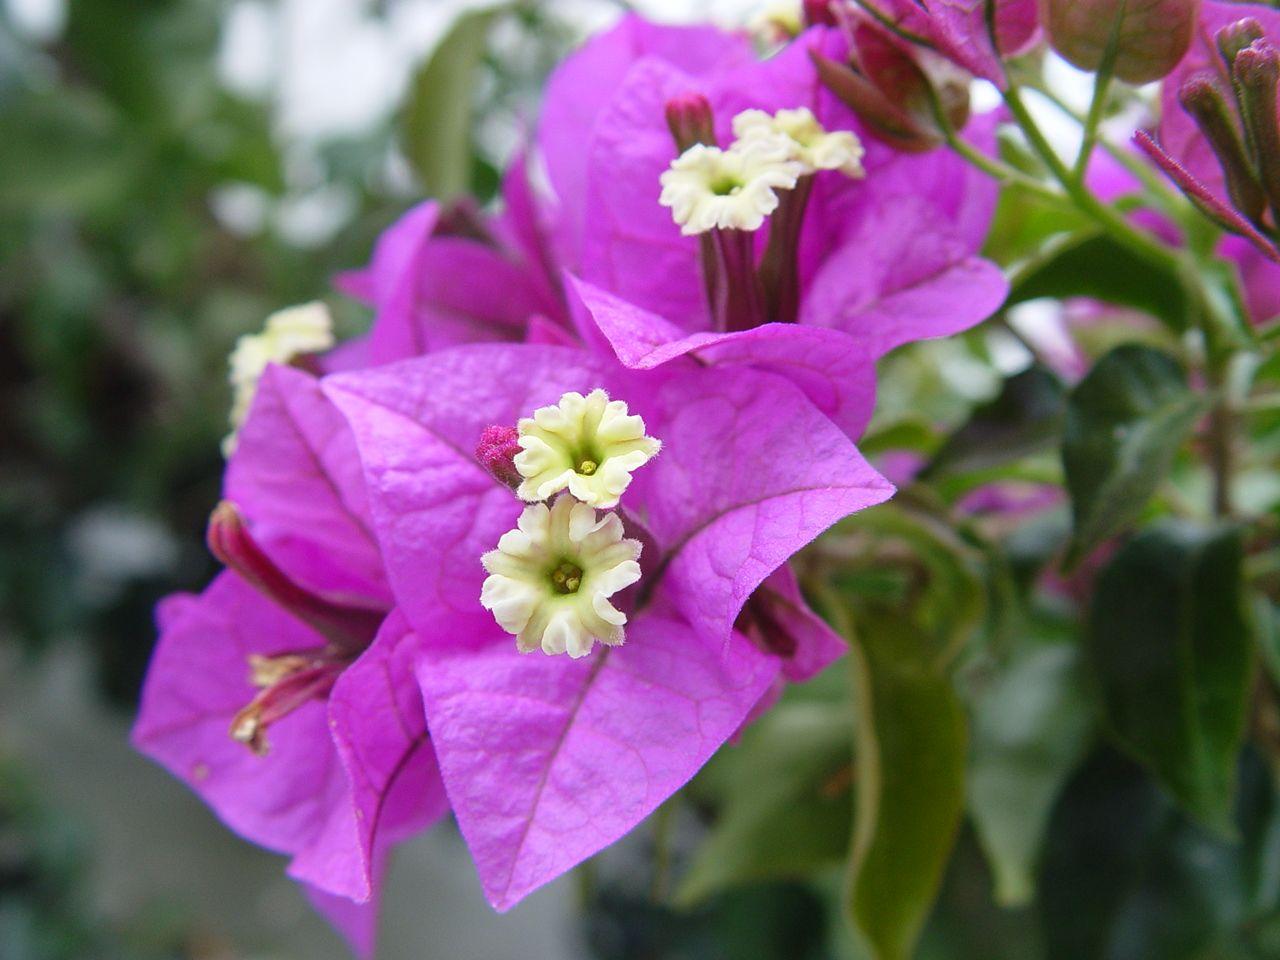 Bougainville Fleur dedans bougainvillea often misunderstood. | bougainvillea, bougainvillea